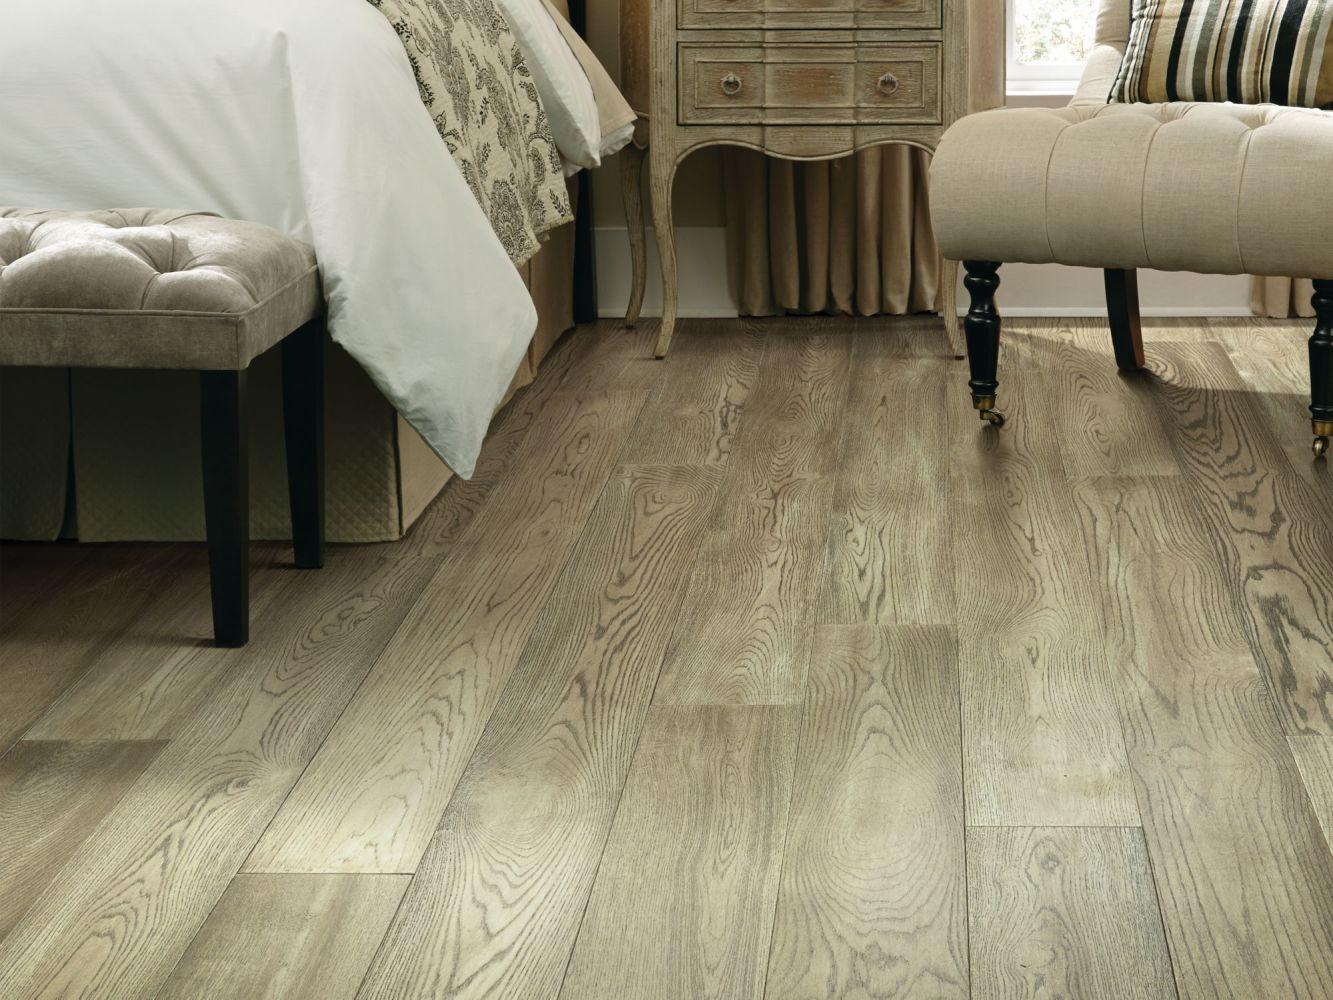 Shaw Floors Floorte Exquisite Brightened Oak 01057_BF700